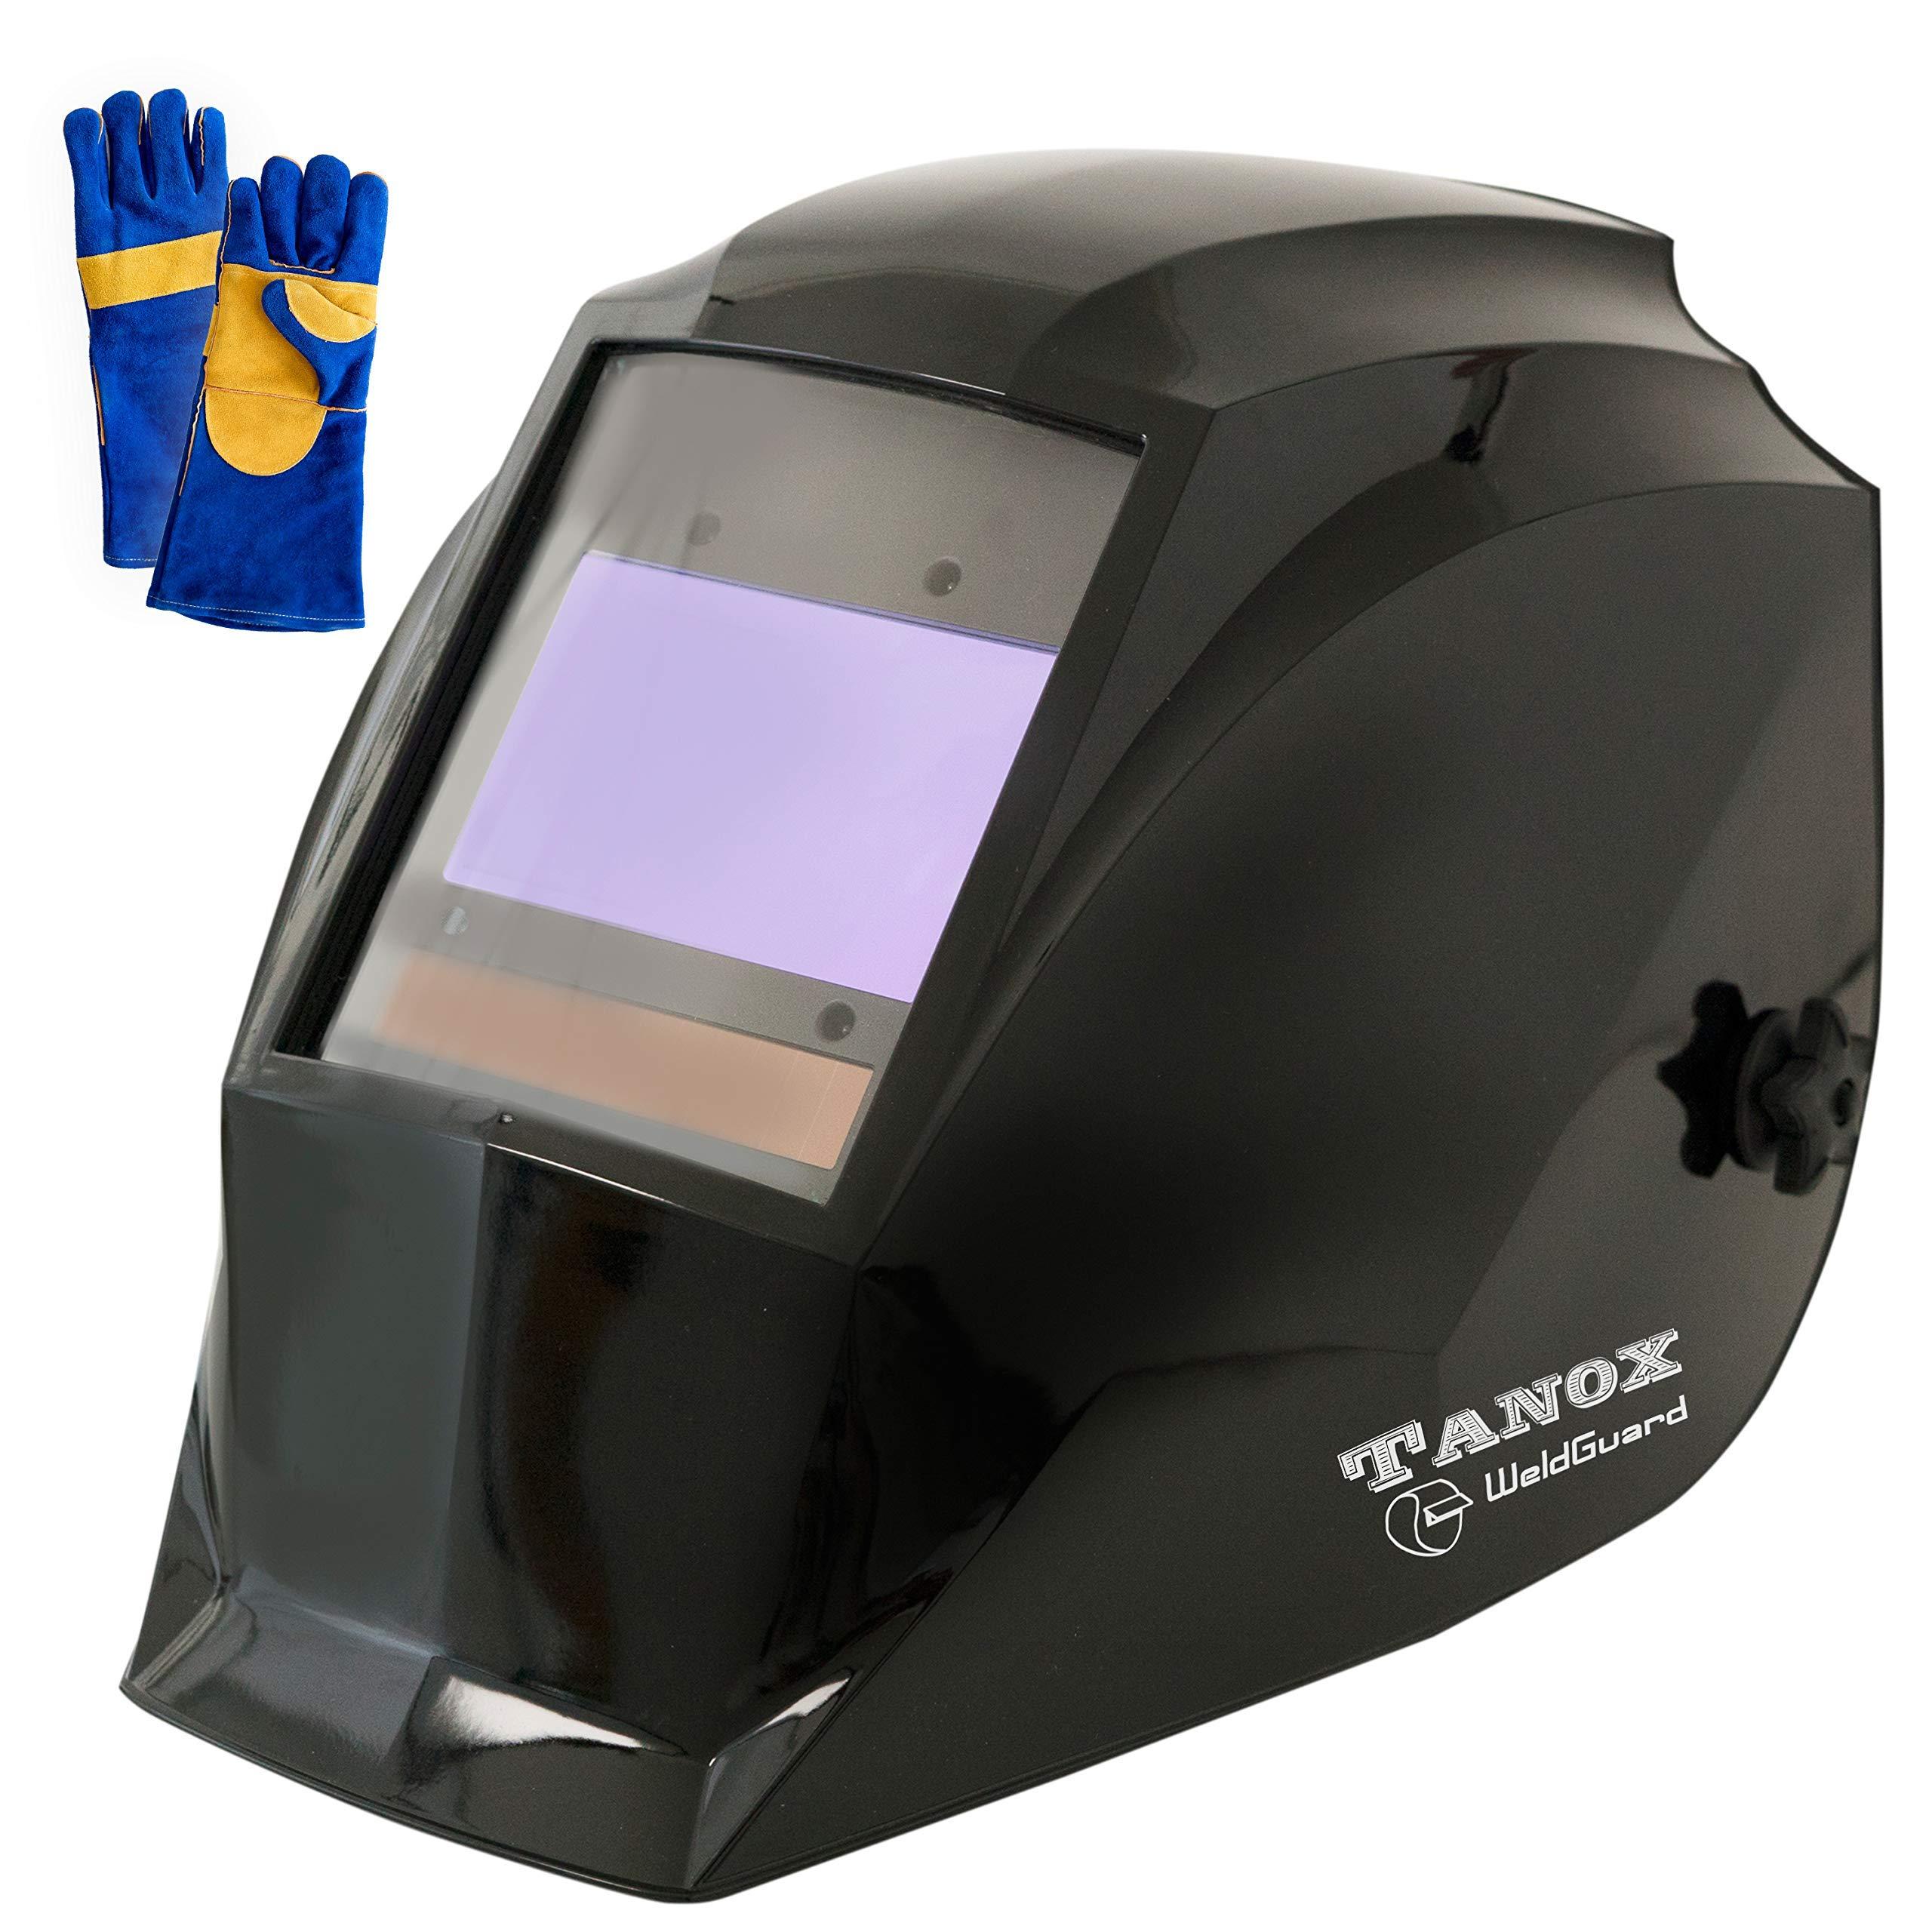 Digital Control Auto Darkening Solar Powered Welding Helmet ADF-210S, Solar Shade Lens, Tig Mig MMA, Adjustable Range 4/9-1316 Bonus 16'' Fire Retardant Welding Gloves, Carrying Bag and Spare Lens